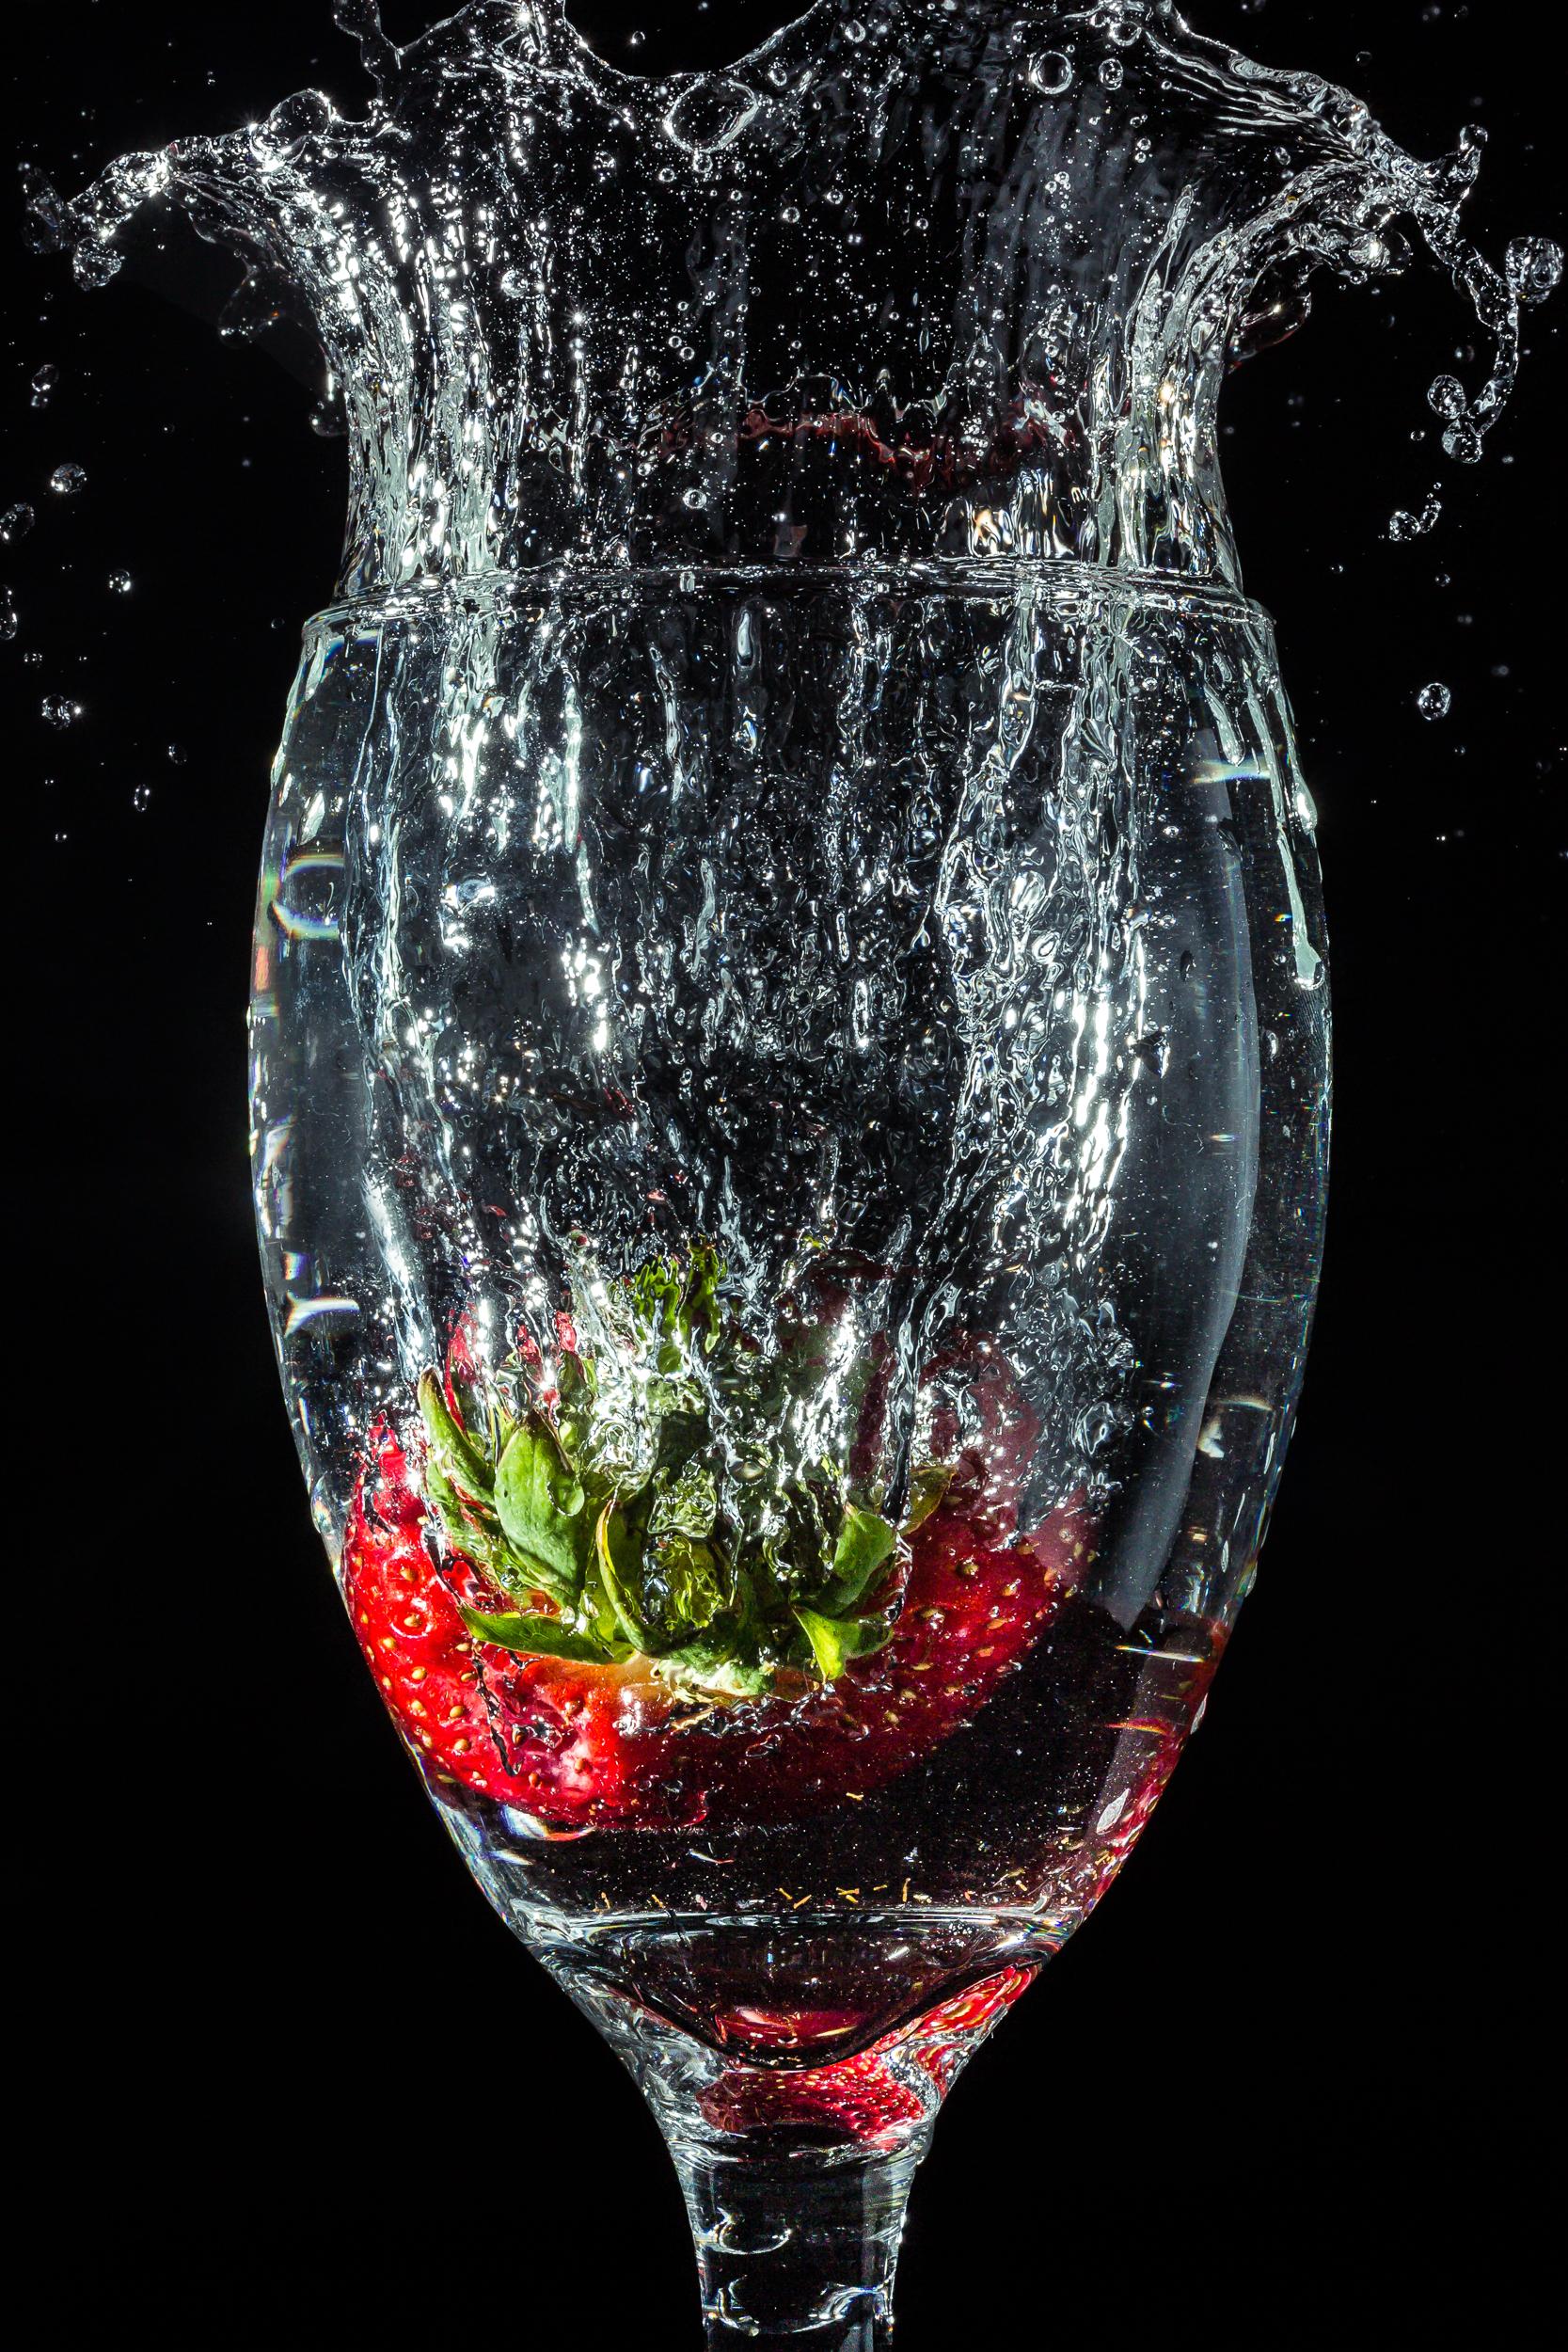 flash-freeze-fruit-3.jpg